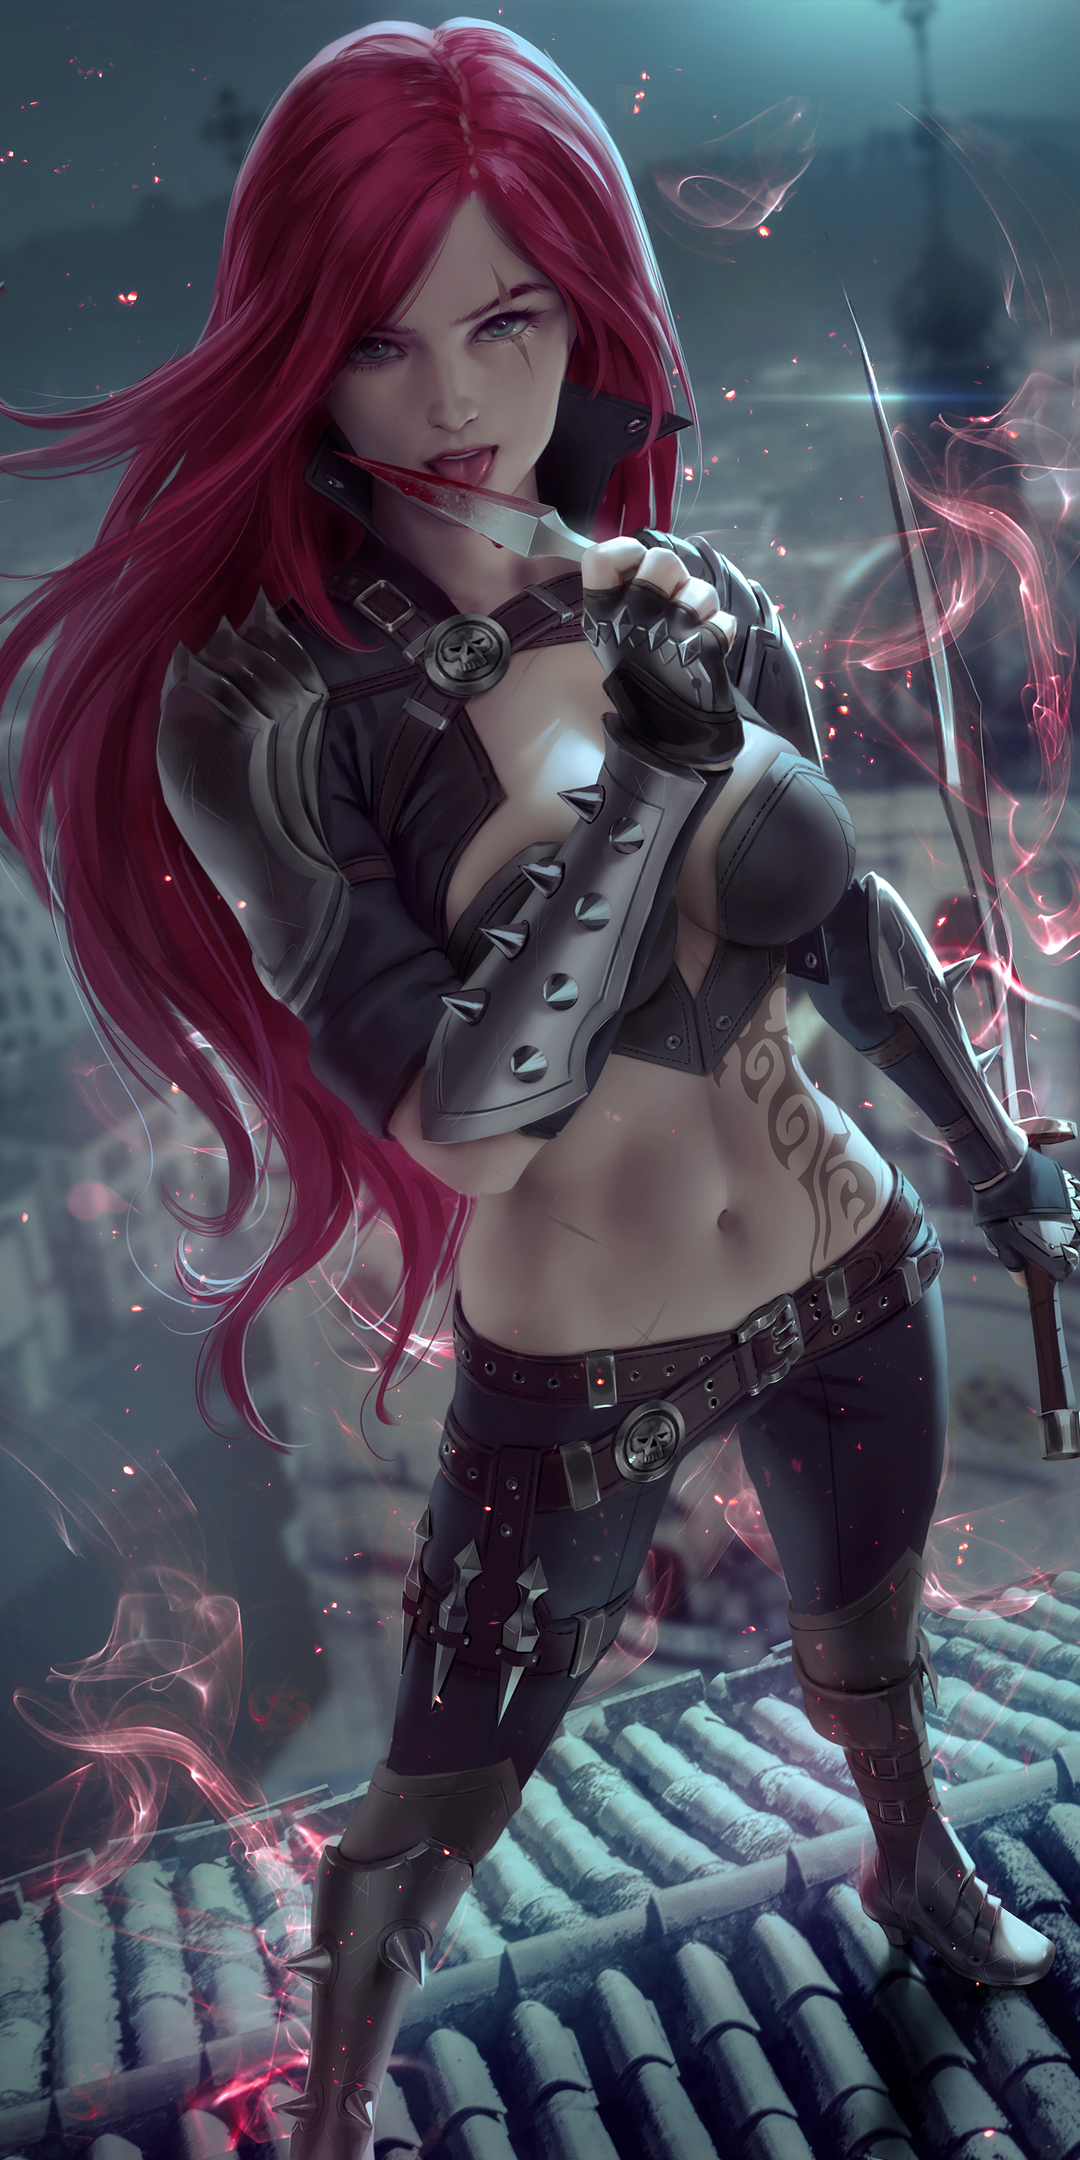 redhead-fantasy-warrior-girl-with-sword-4k-hf.jpg